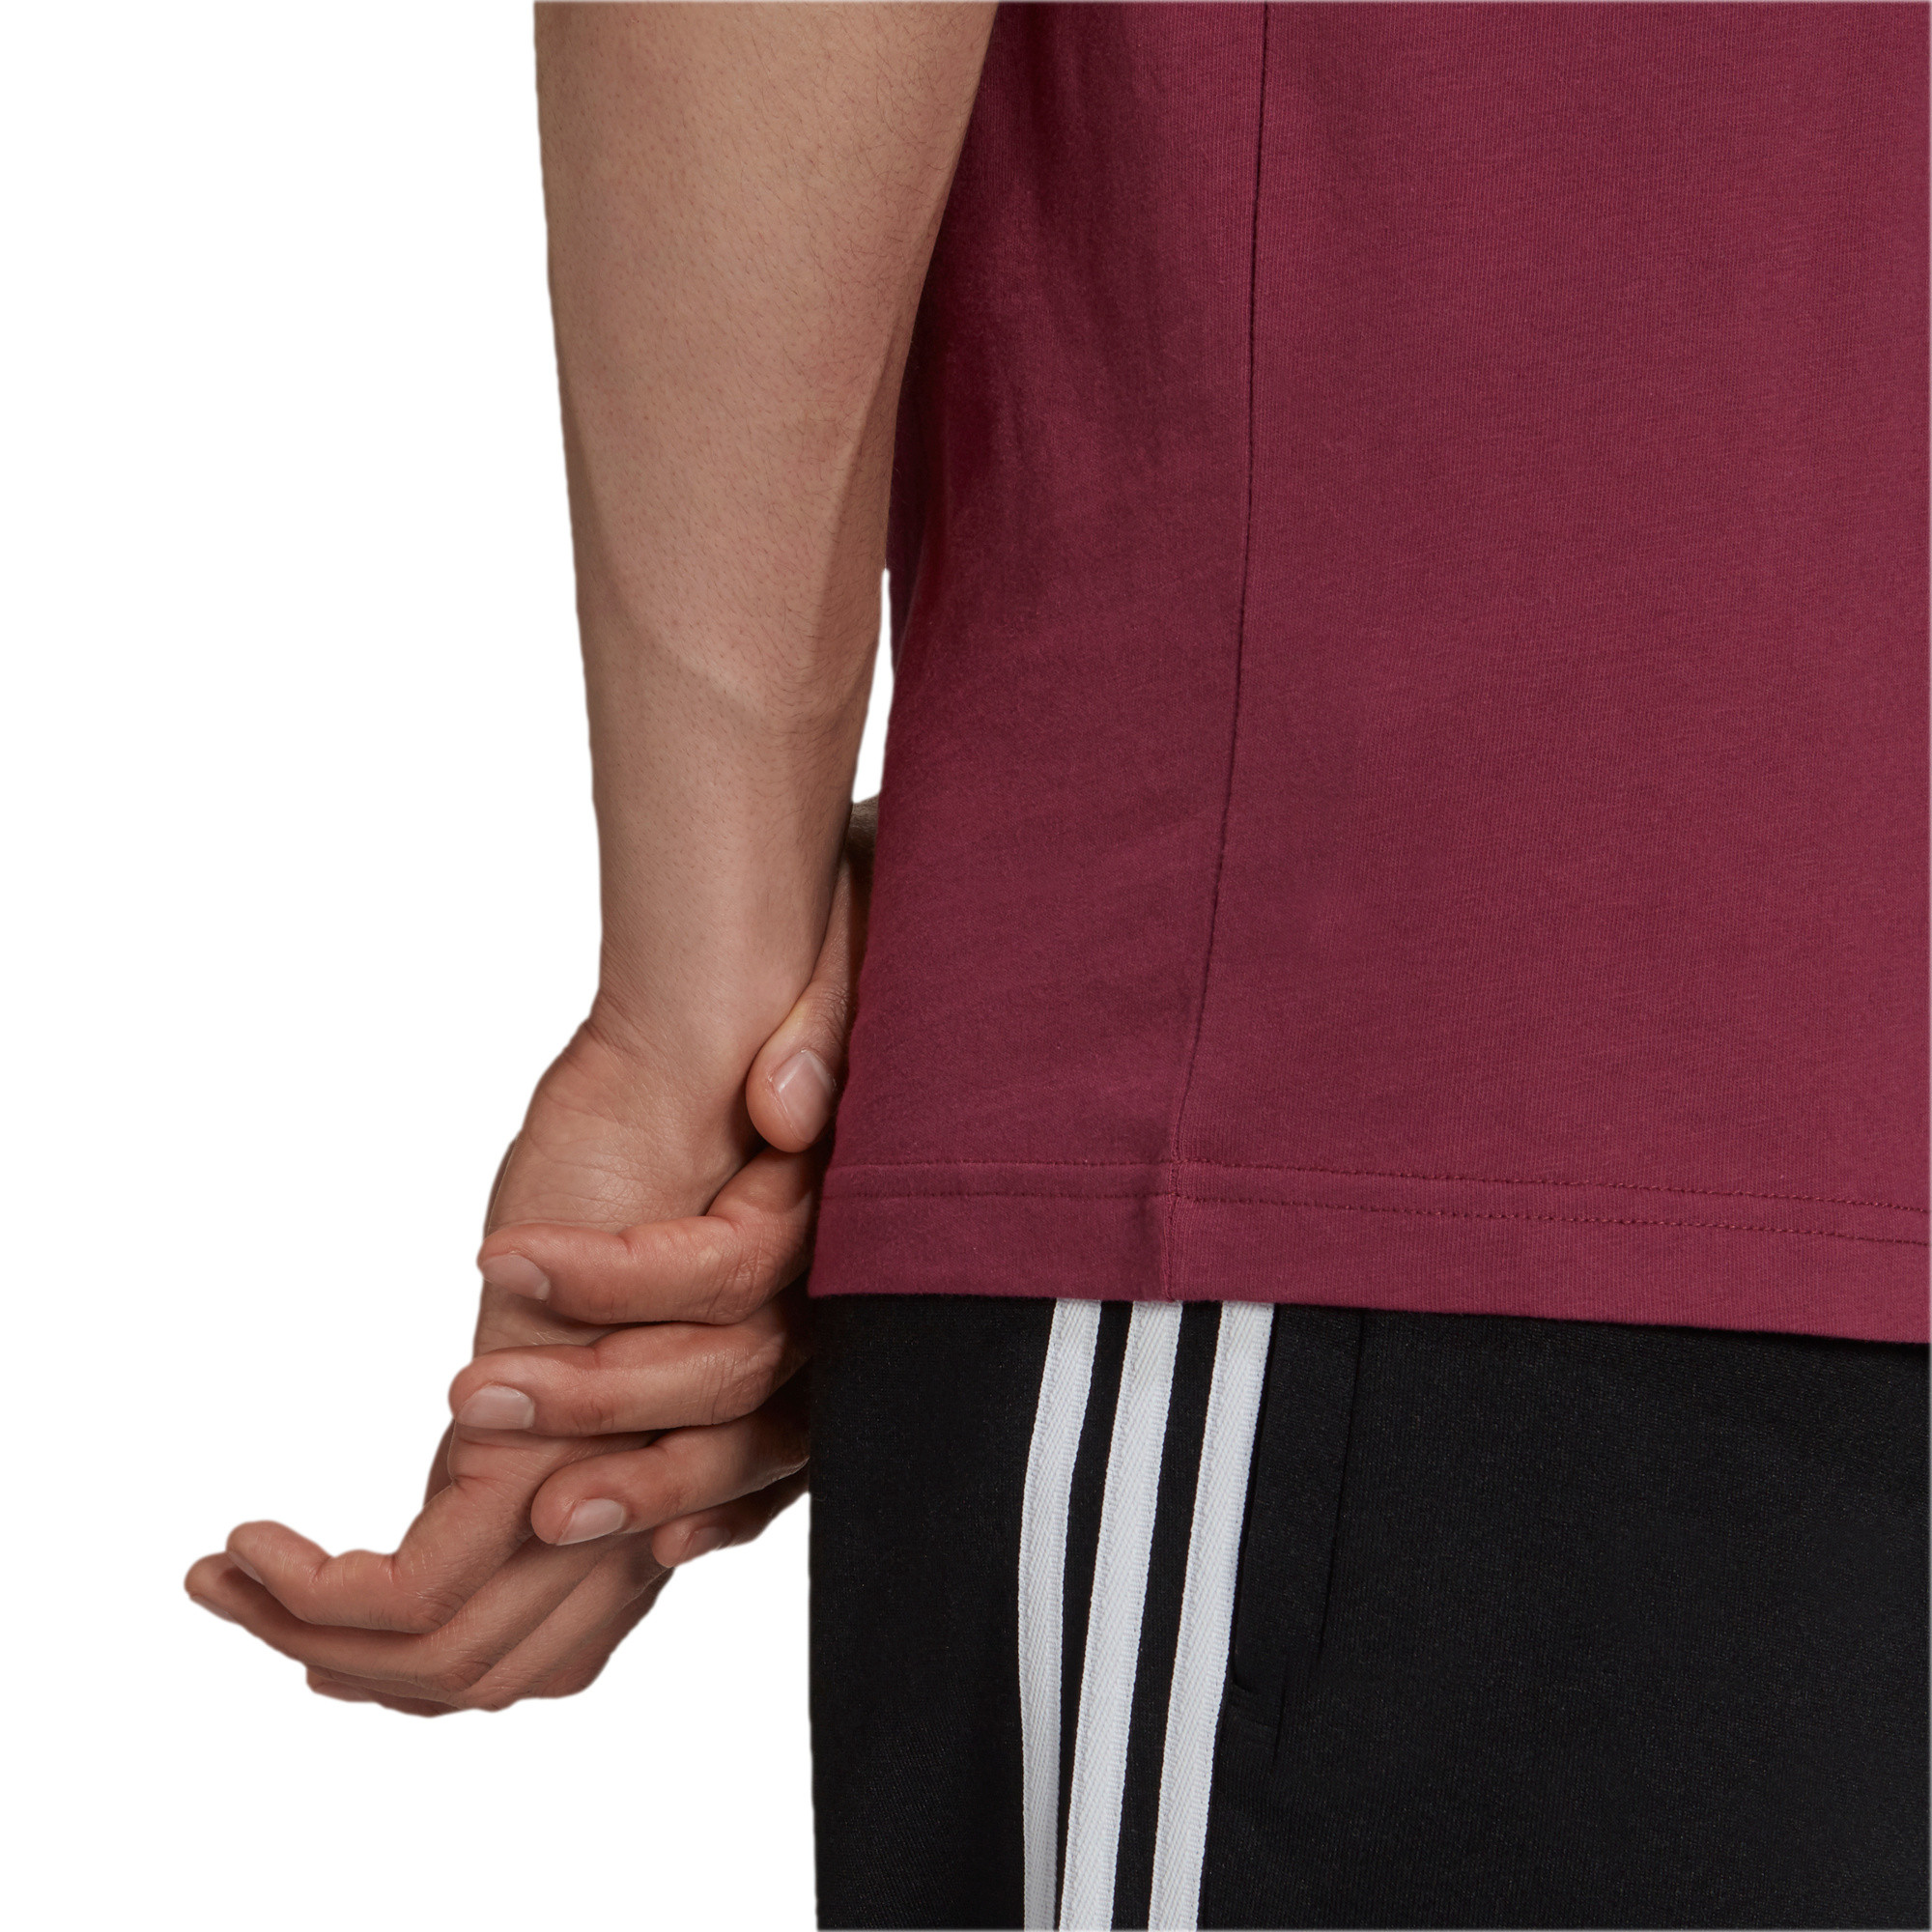 T-shirt uomo adicolor Classics Trefoil, Bianco/Rosso, large image number 5